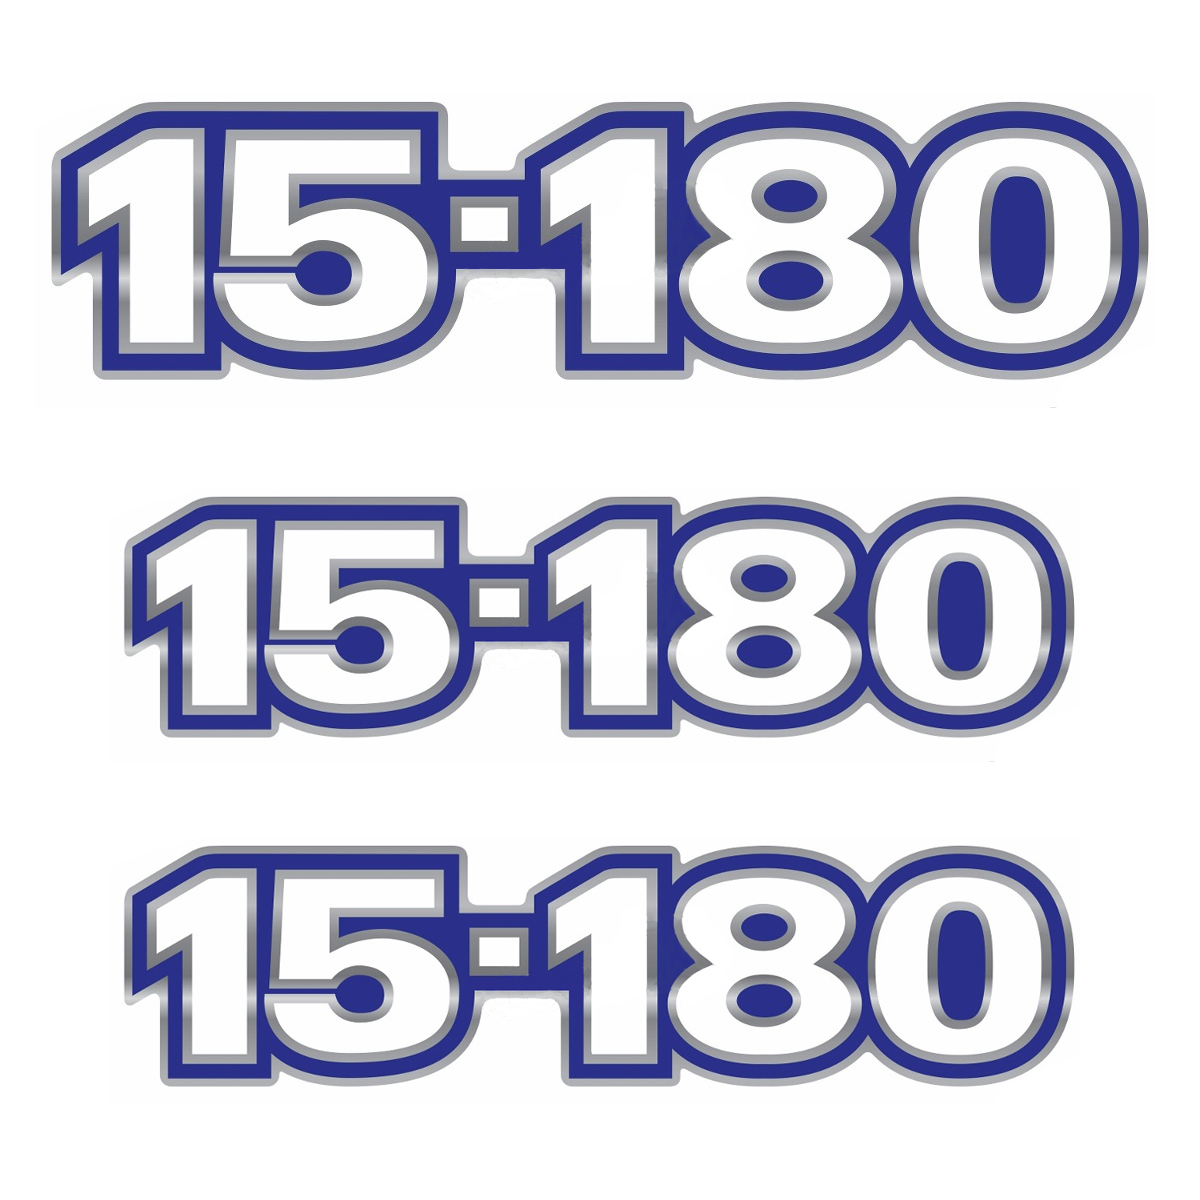 Emblema Caminhão Vw 15180 - Kit